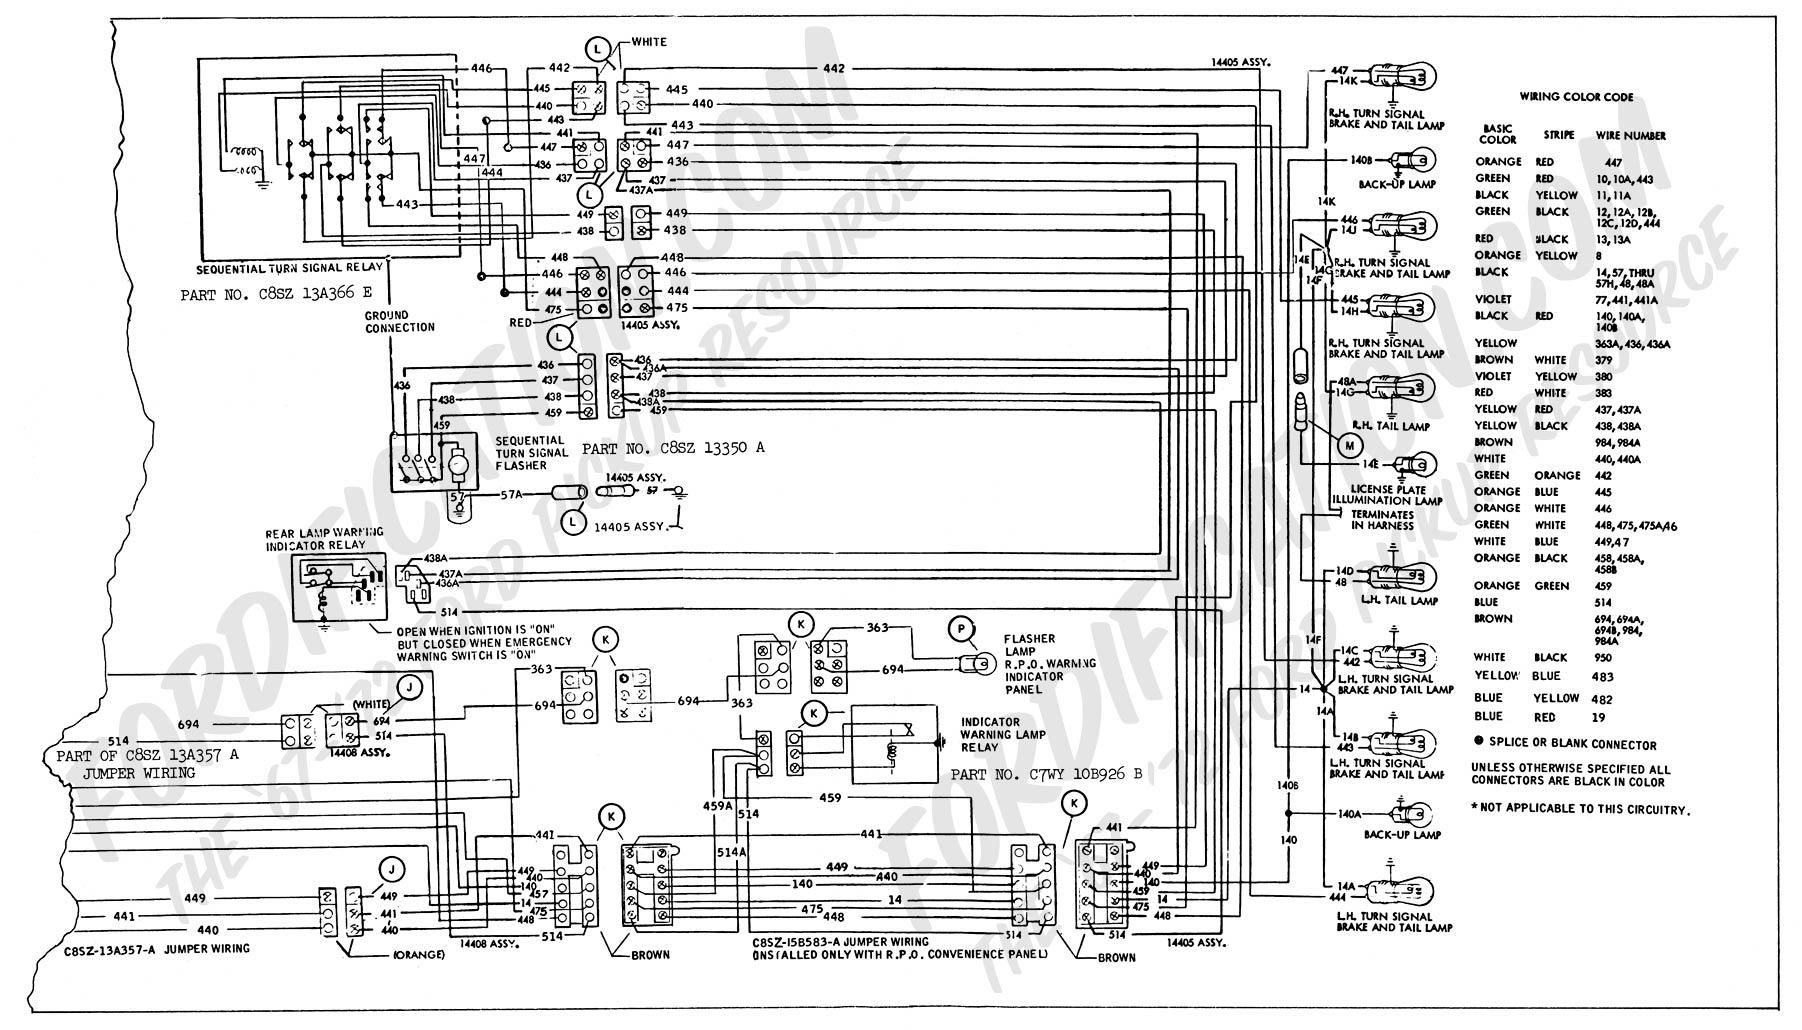 1966 chevelle 2 speed wiper motor besides 1964 chevelle wiring diagram